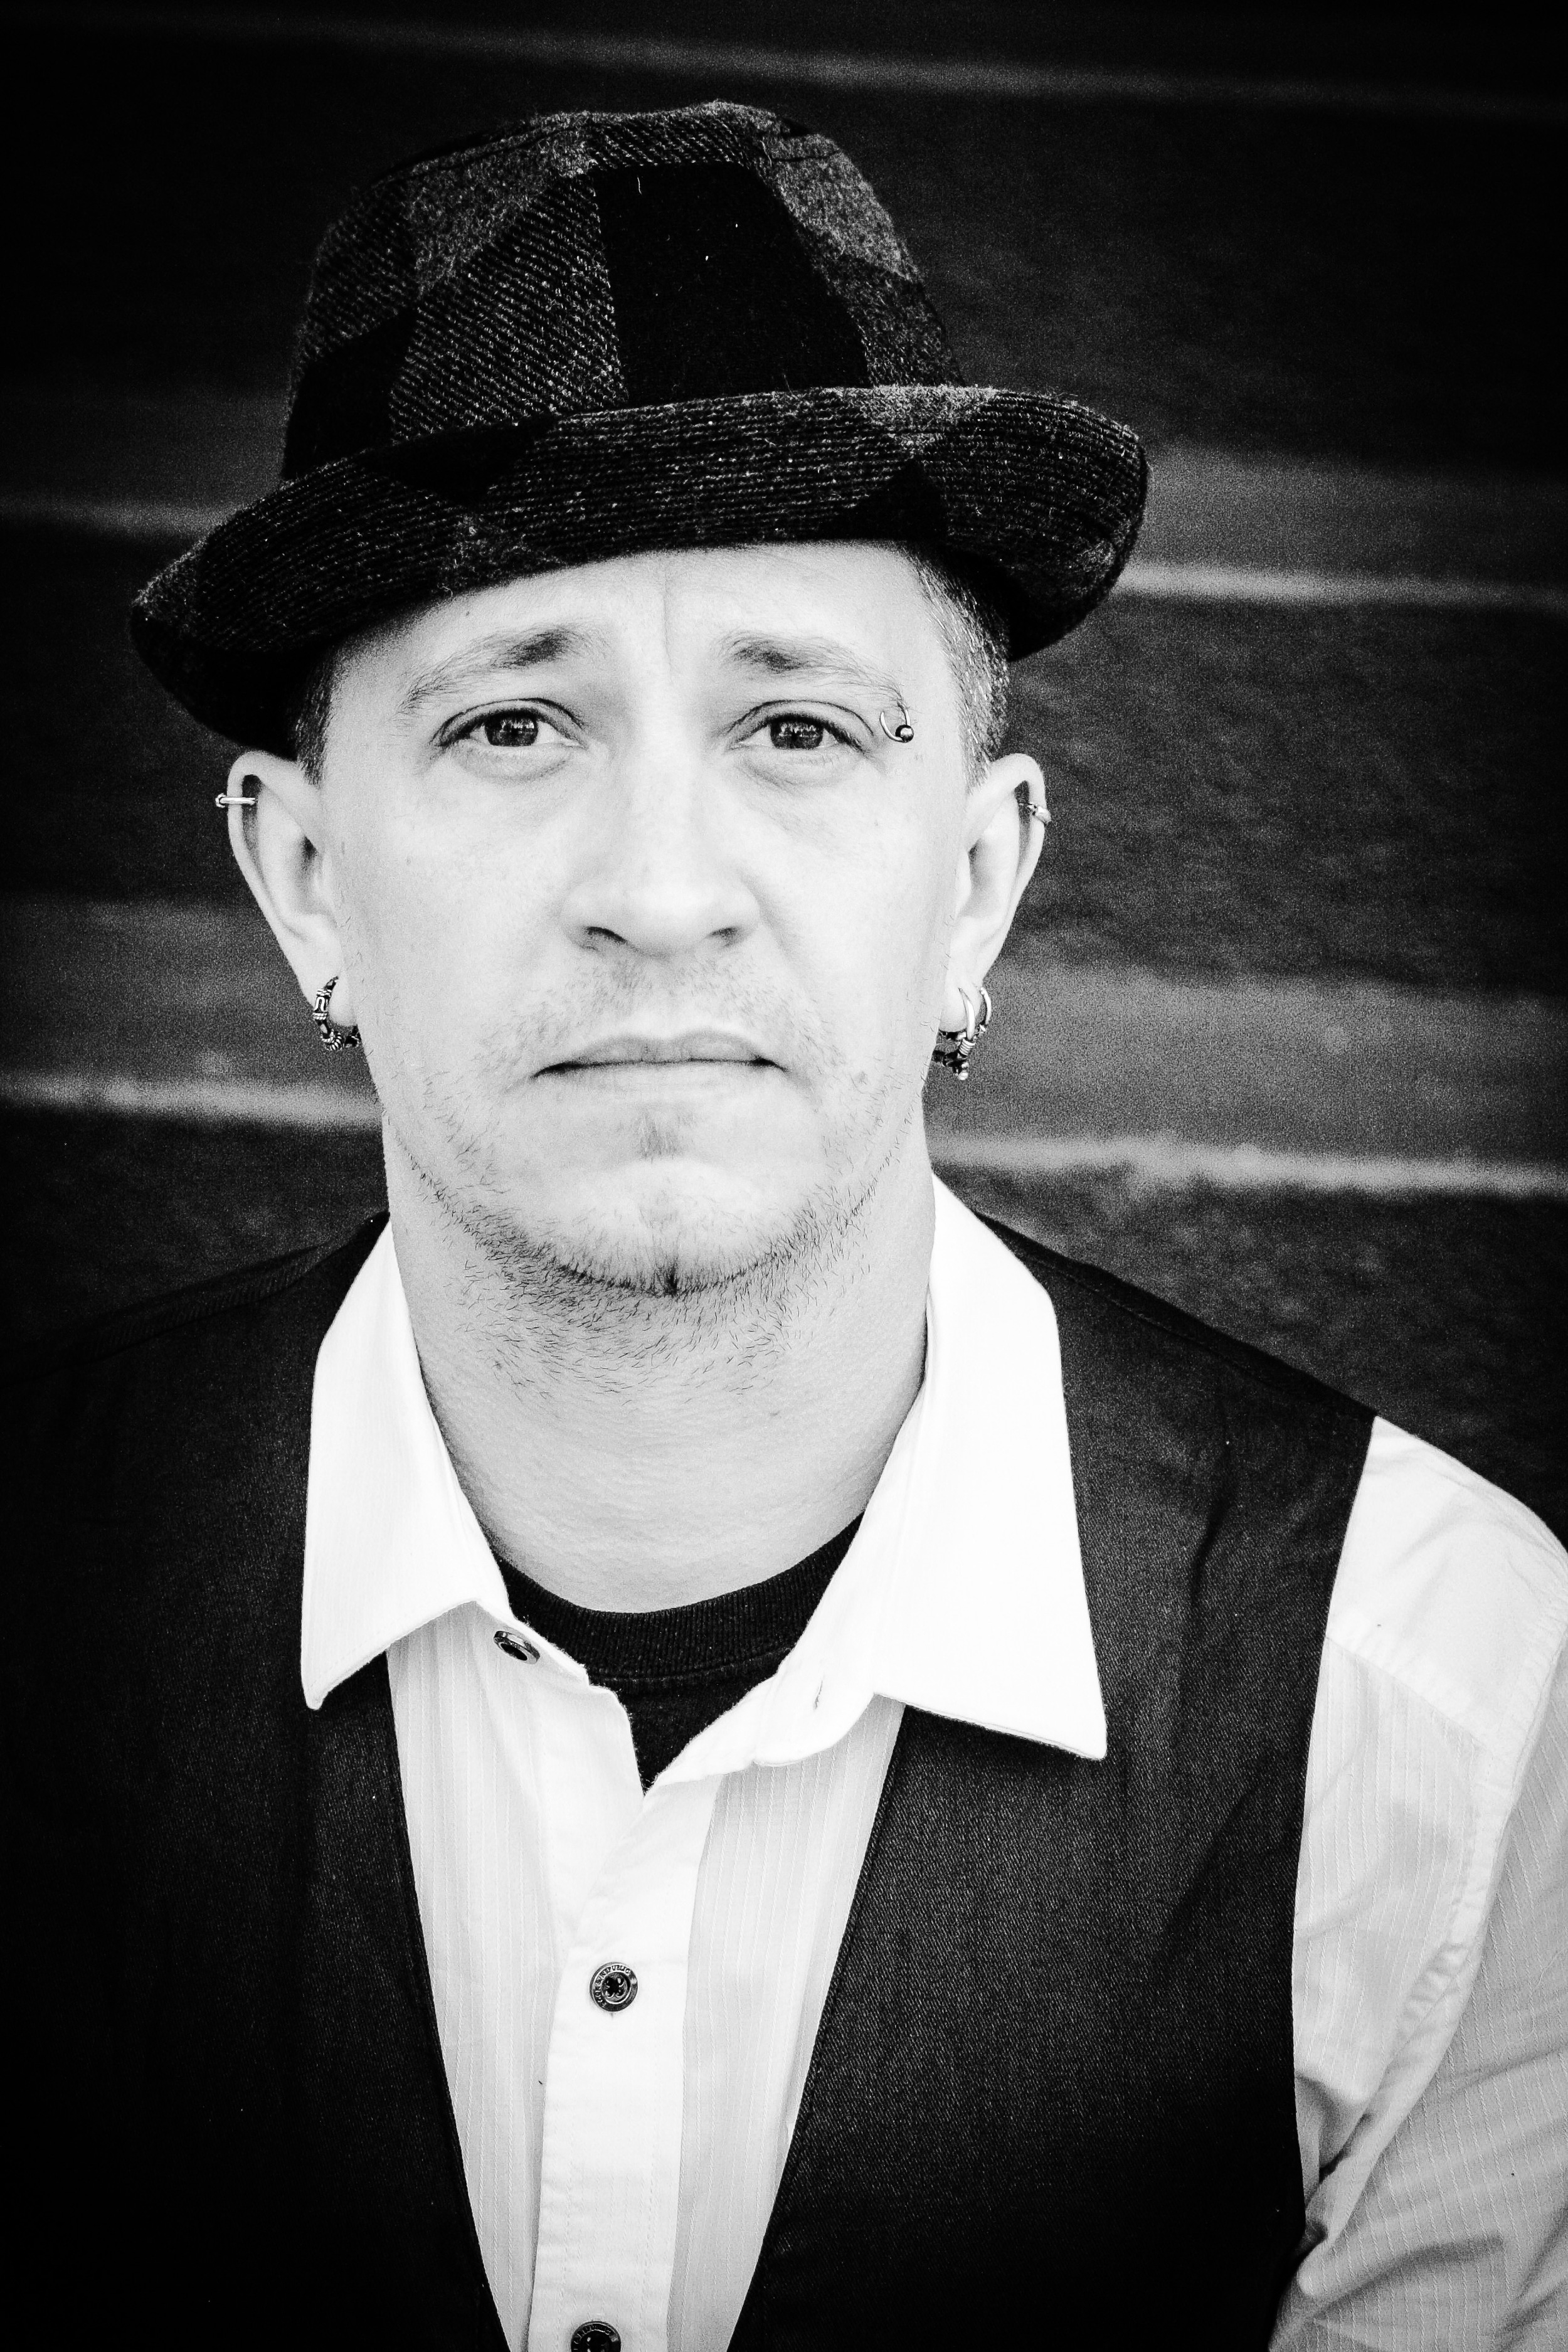 Brad Meehan - Composer/Musician